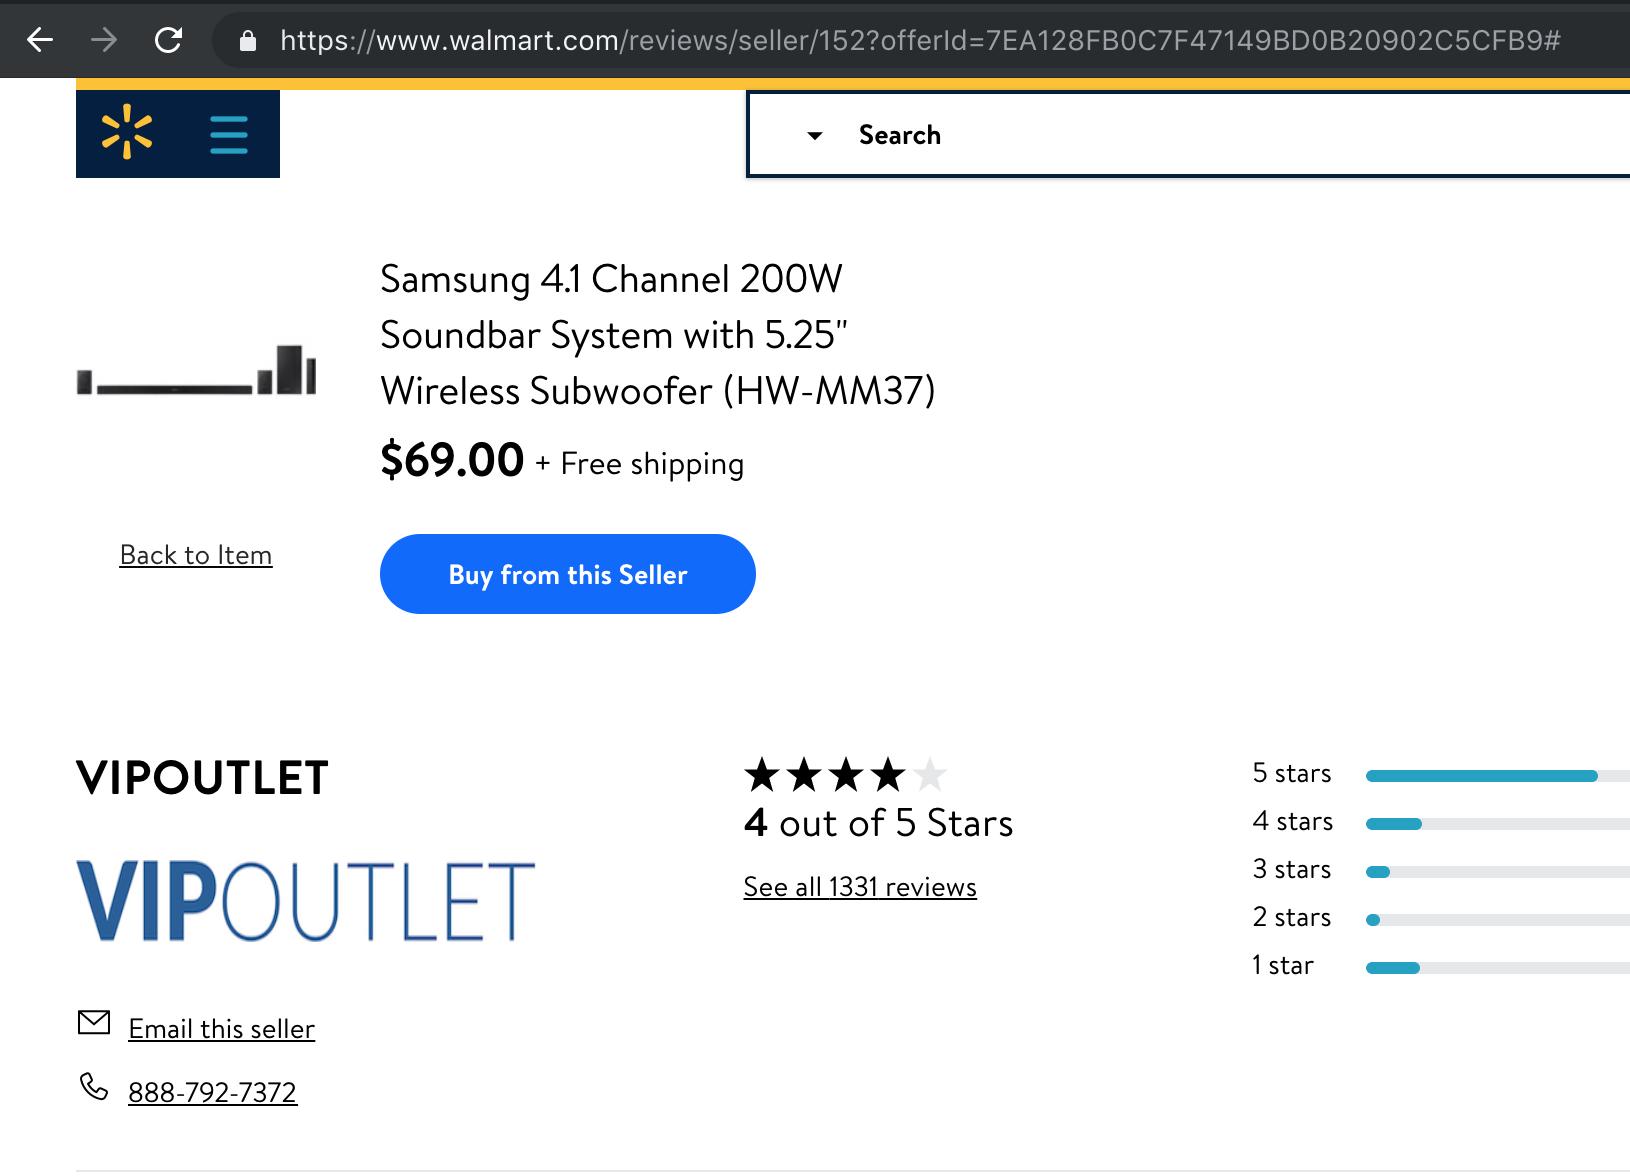 "Samsung 4.1 Channel 200W Soundbar System with 5.25"" Wireless Subwoofer (HW-MM37) - Refurbished $69"